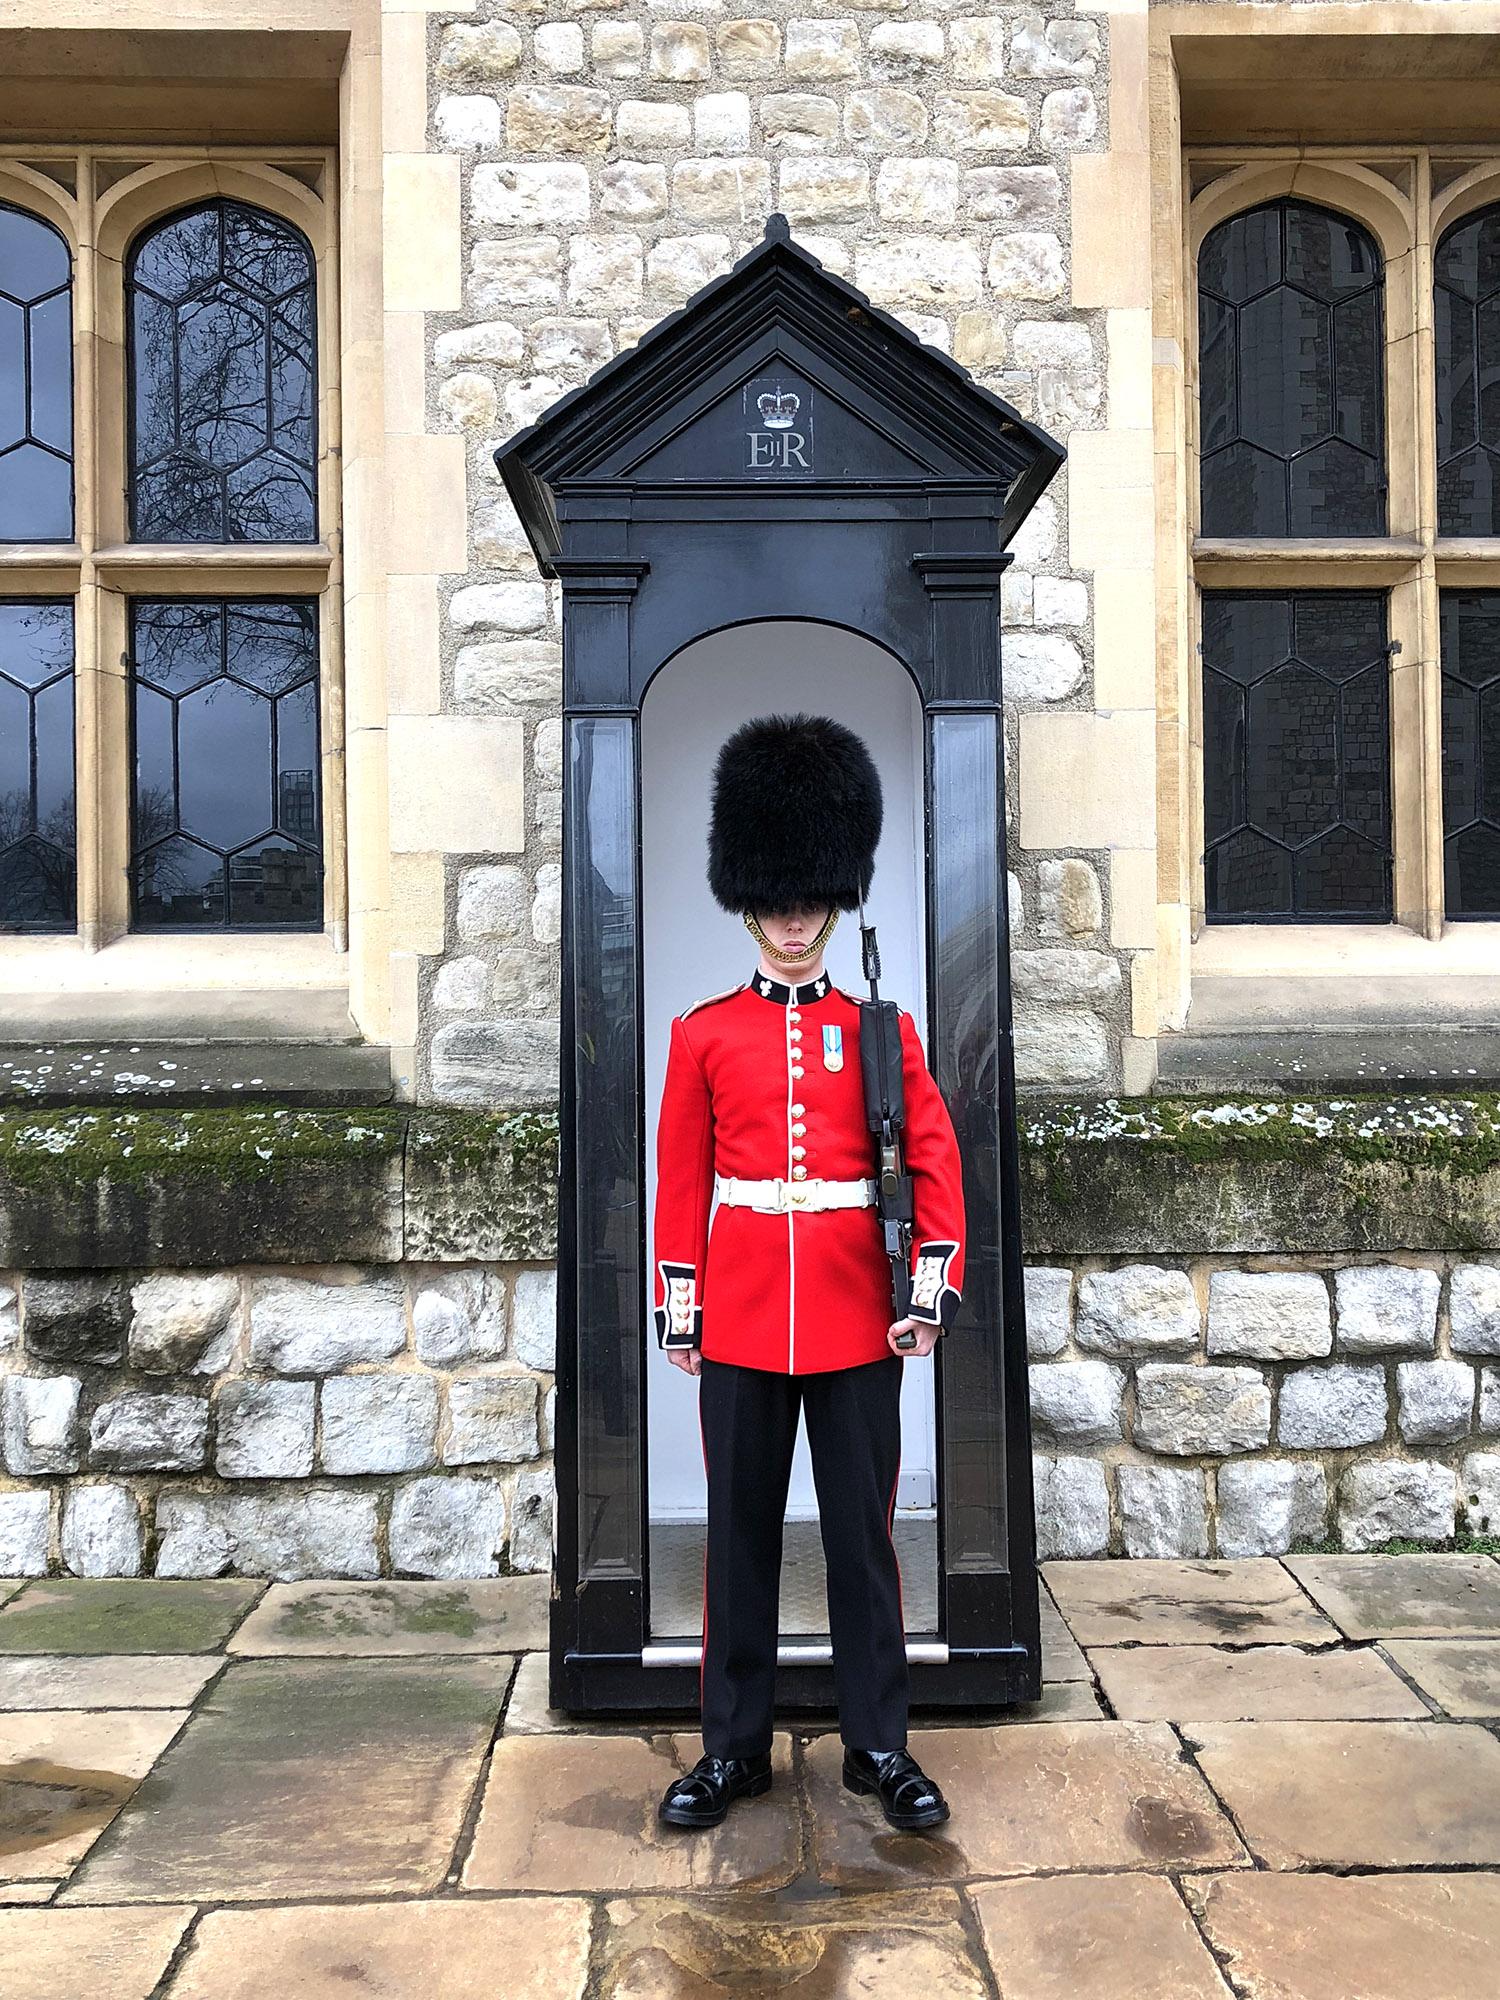 Tower of London - Garde